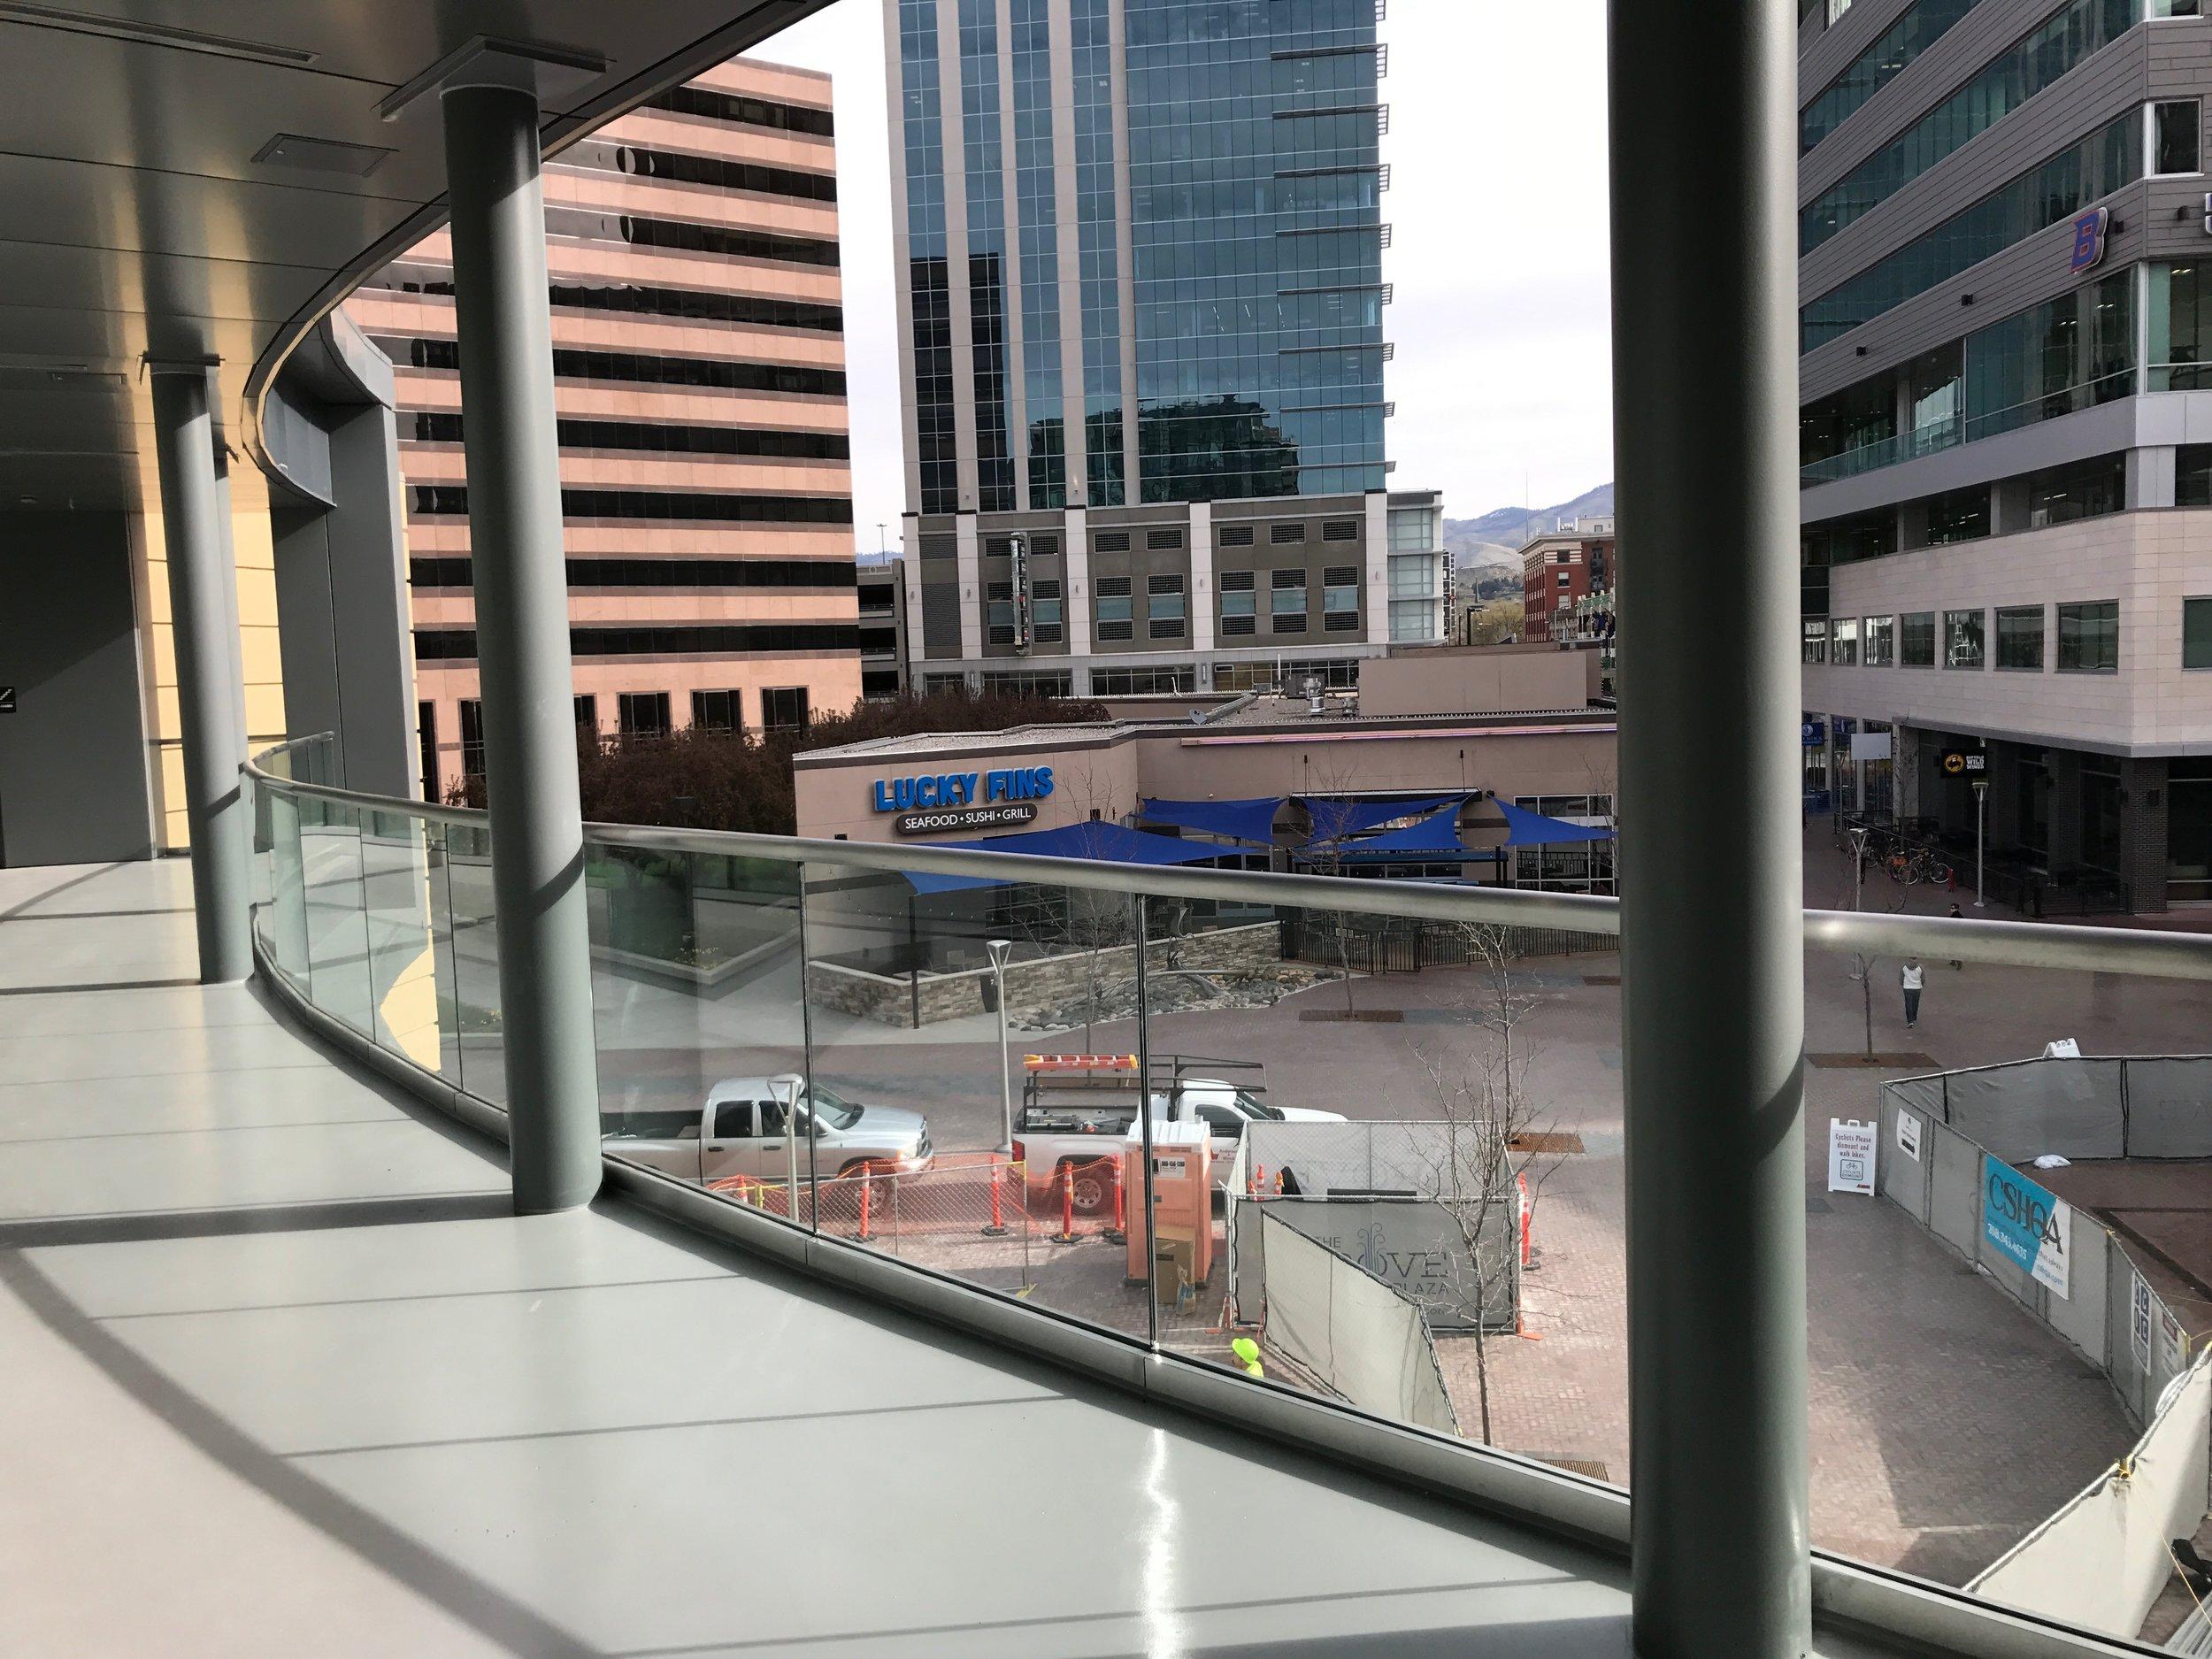 Outdoor area overlooking Grove plaza adjacent to original Boise Center building